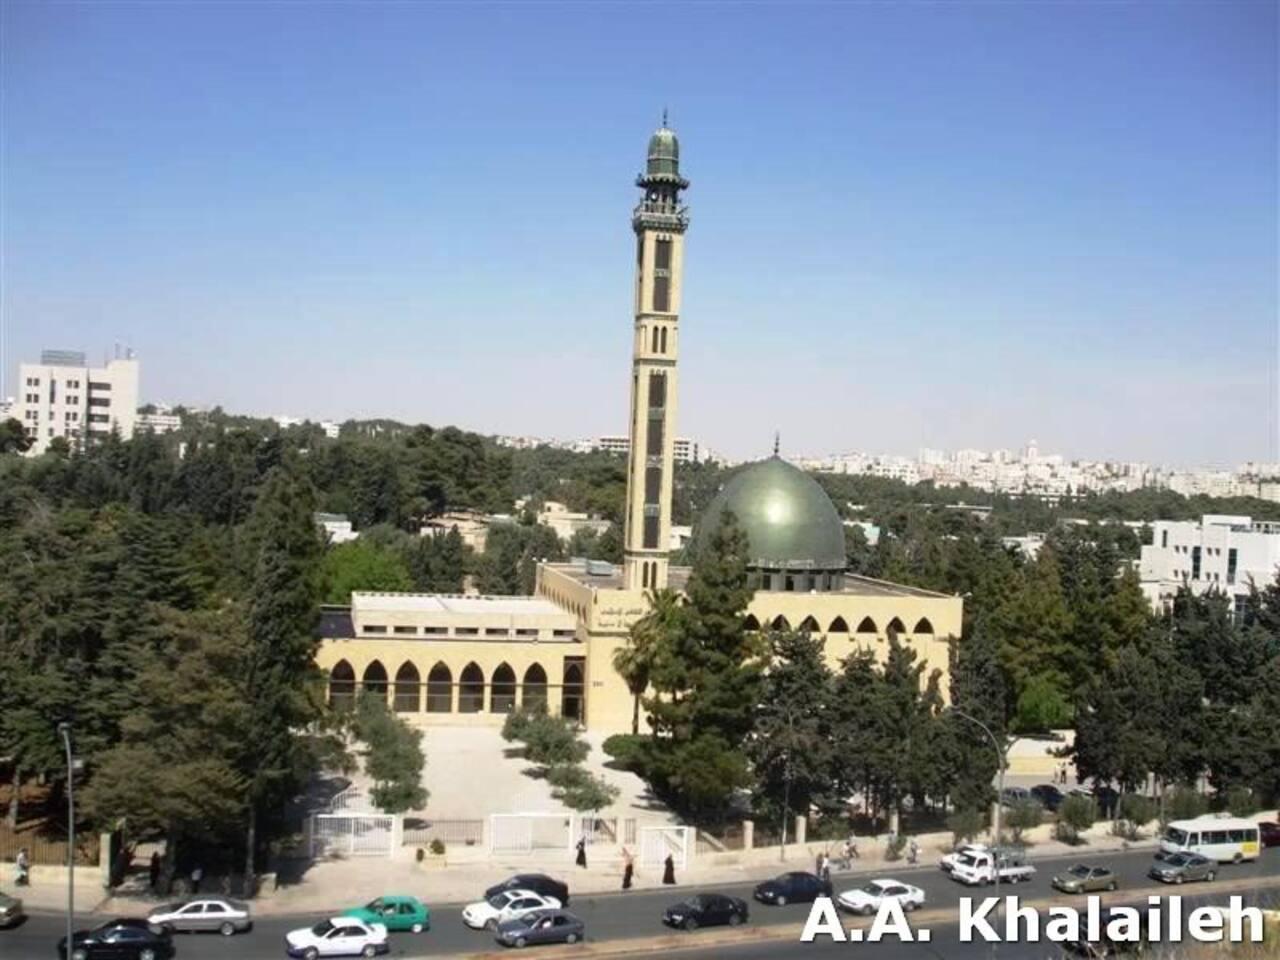 The building is close to the famous Jordan University.